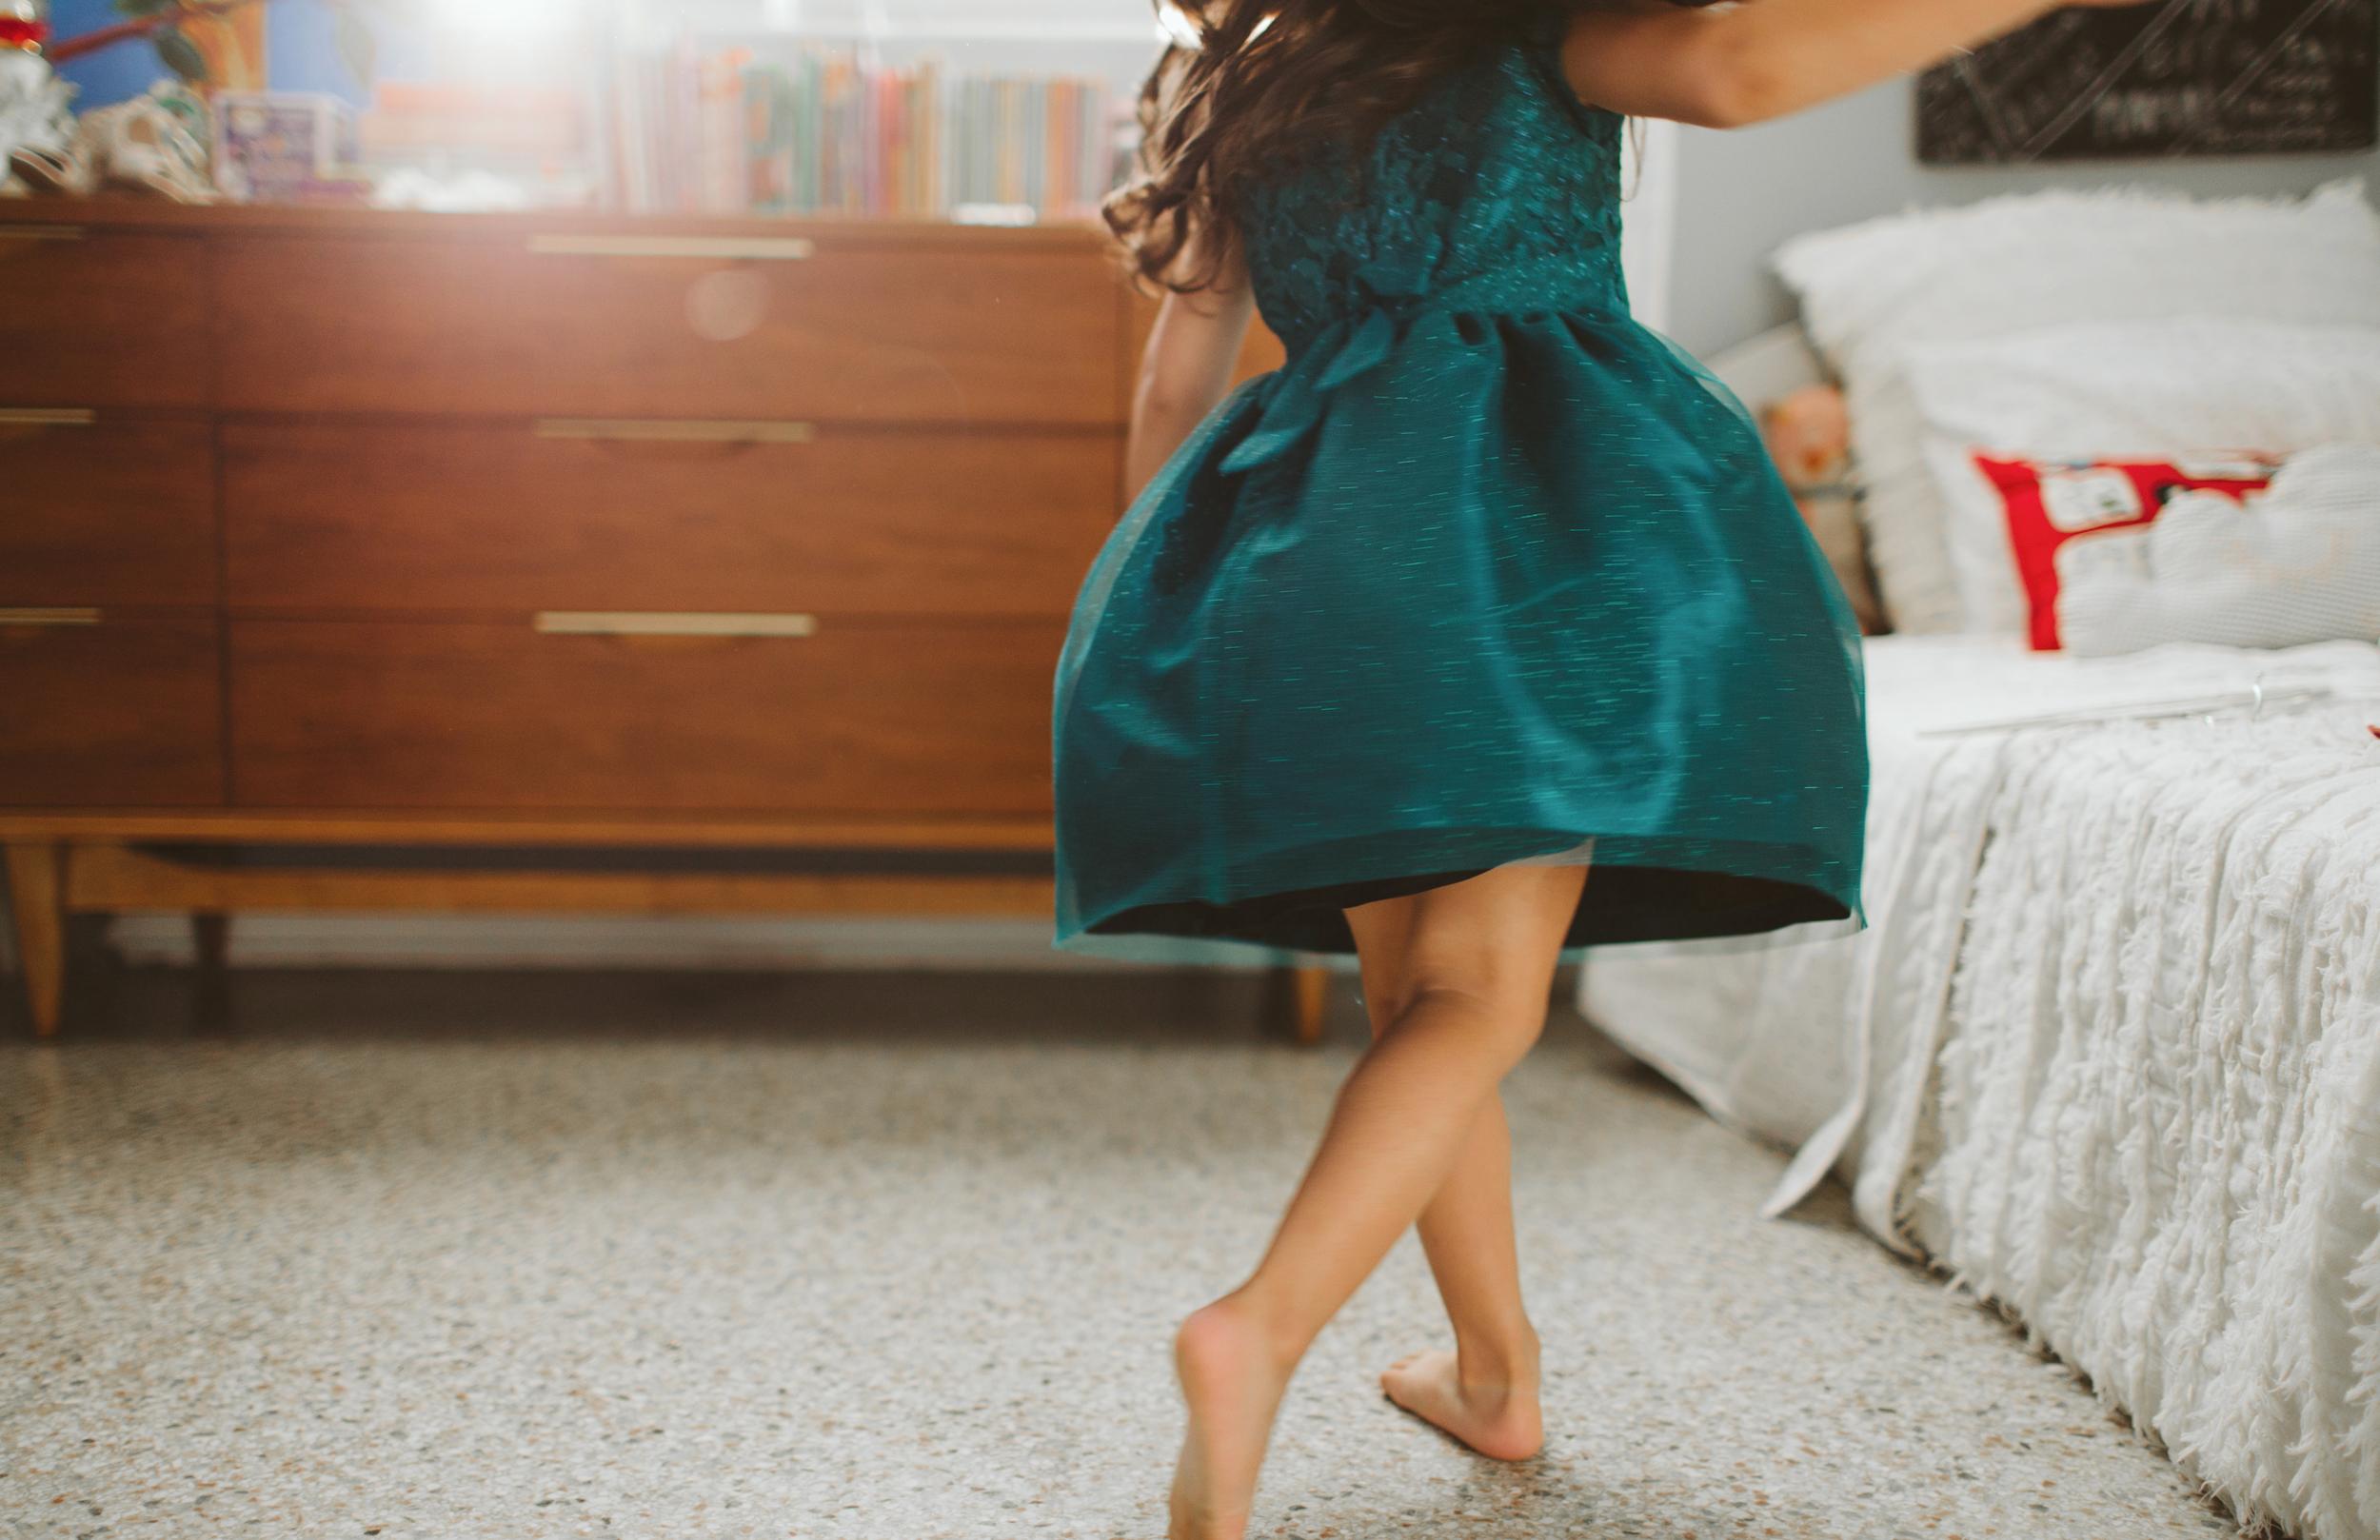 Daddy daughter dance | Vanessa Boy |VANESSABOY.COM-92.com final set .jpg